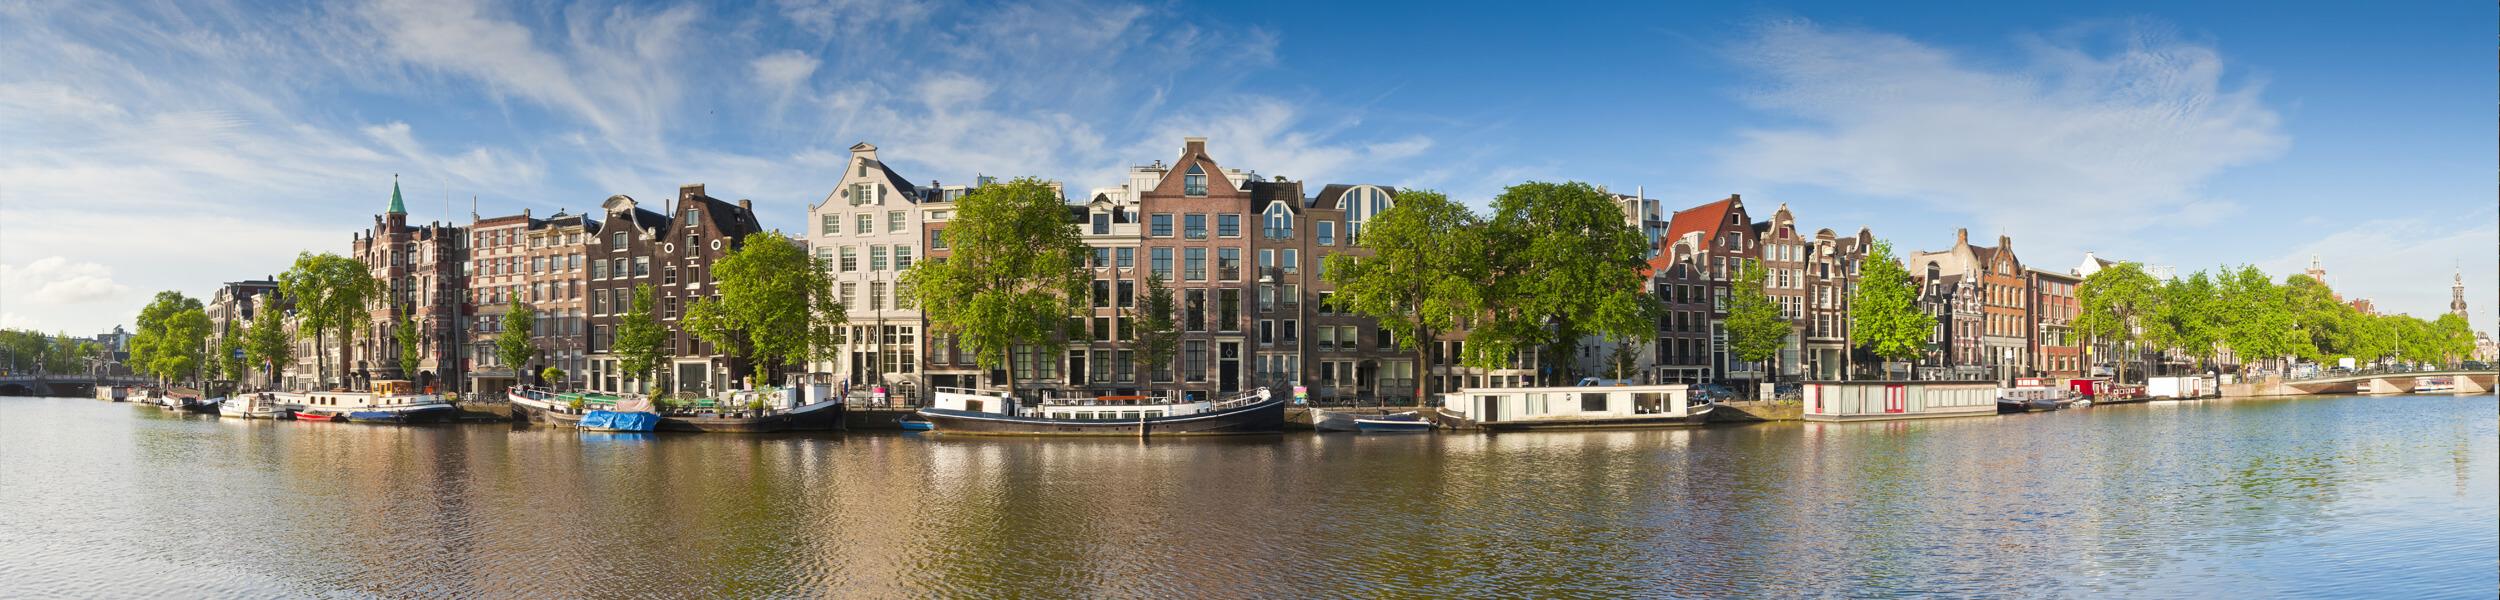 Azure DevOps Engineer Amsterdam, The Netherlands